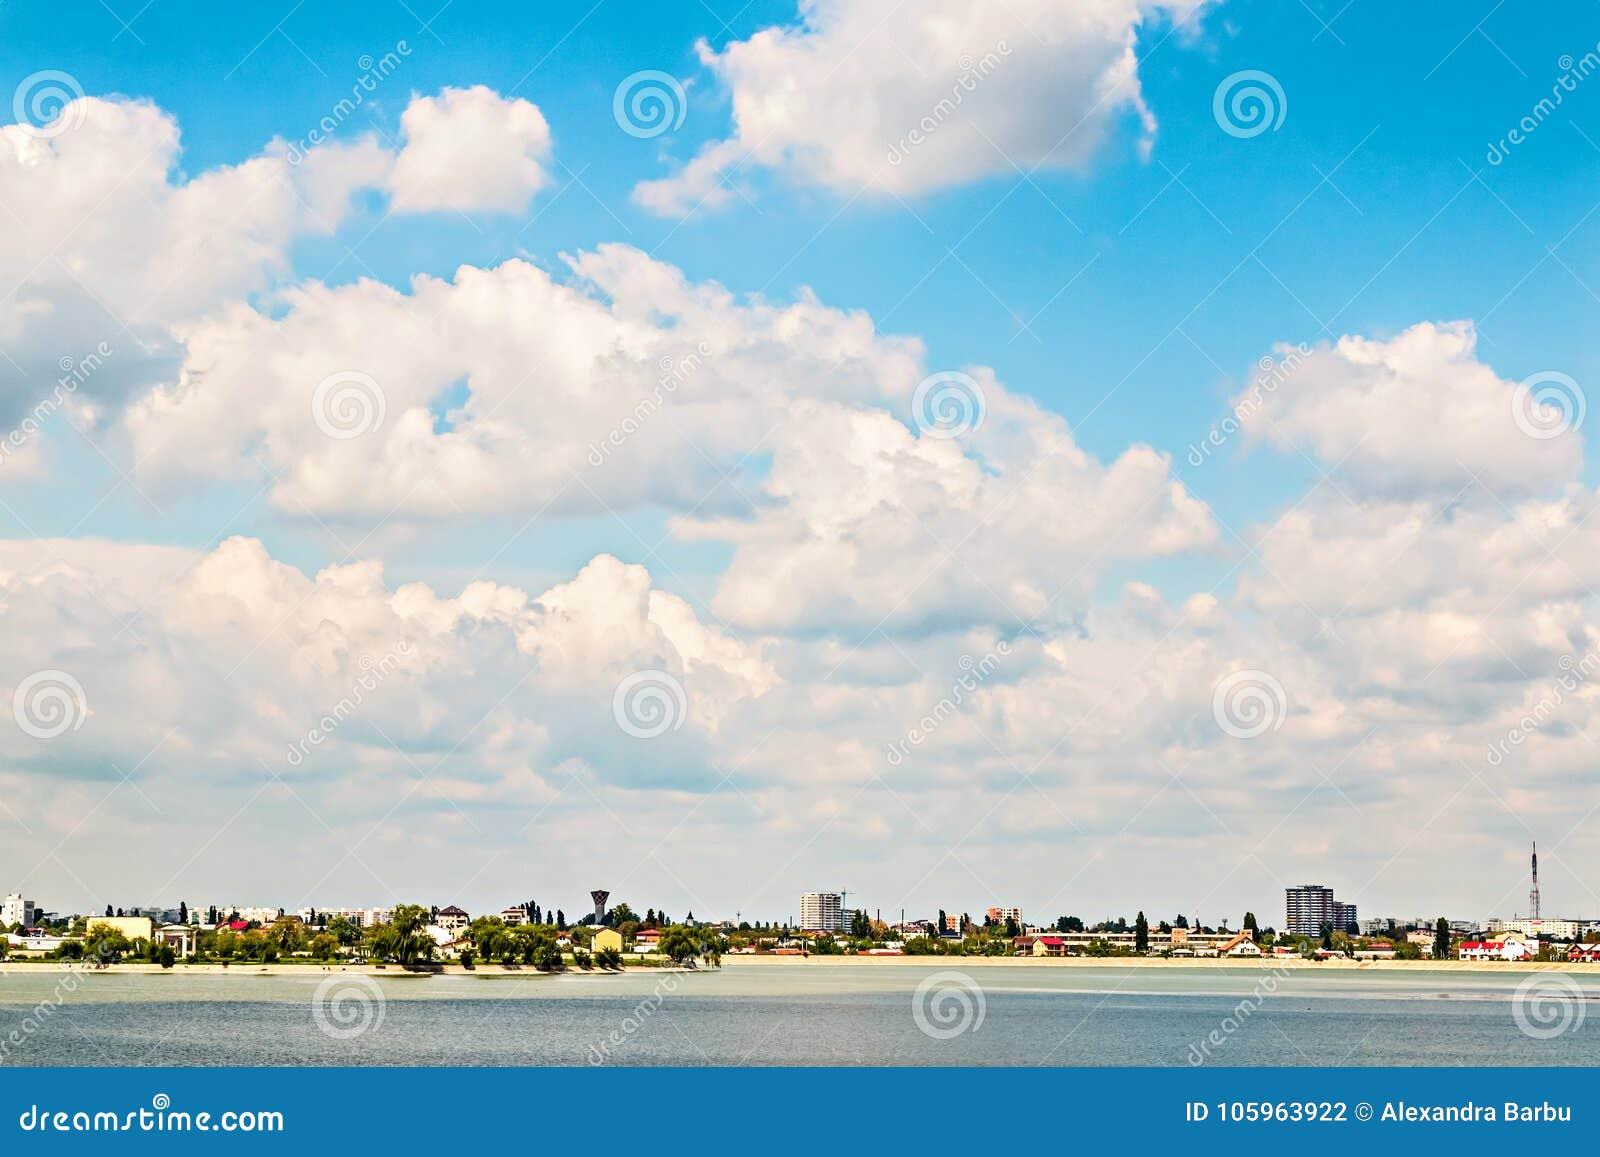 City summer landscape near lake cloudy sky